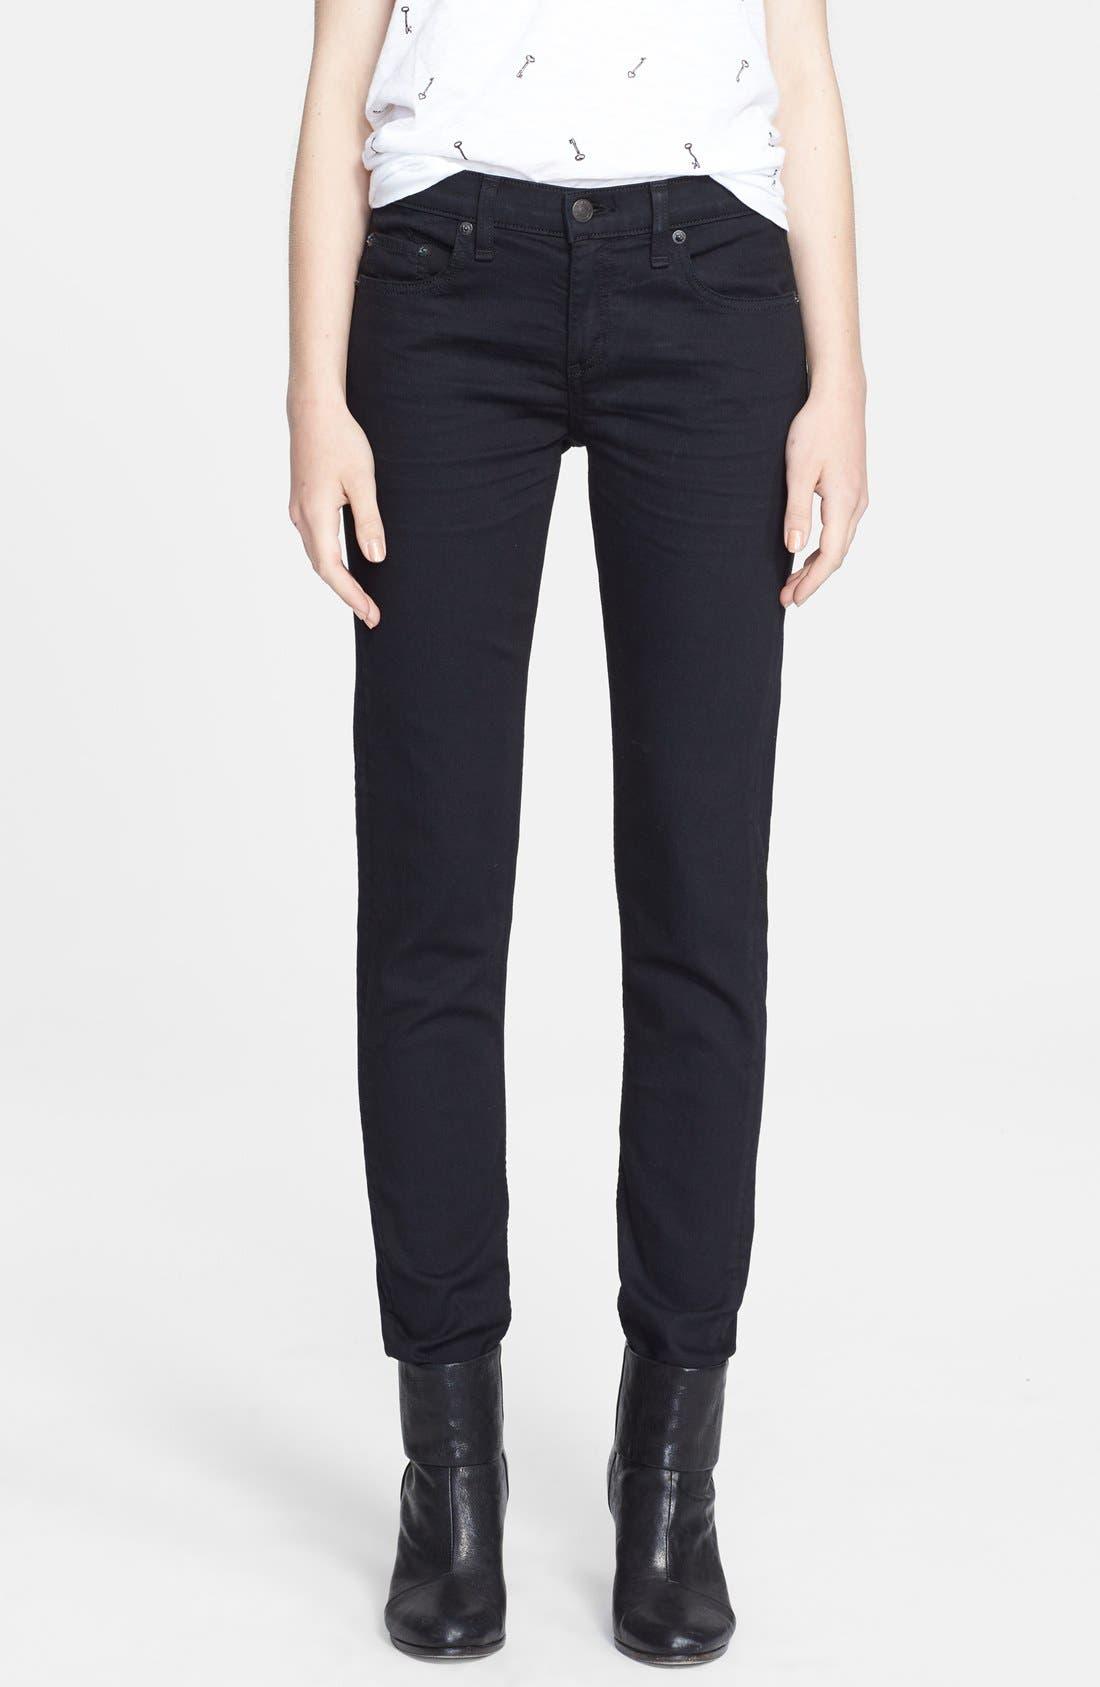 Main Image - rag & bone/JEAN 'The Dre' Skinny Jeans (Aged Black)